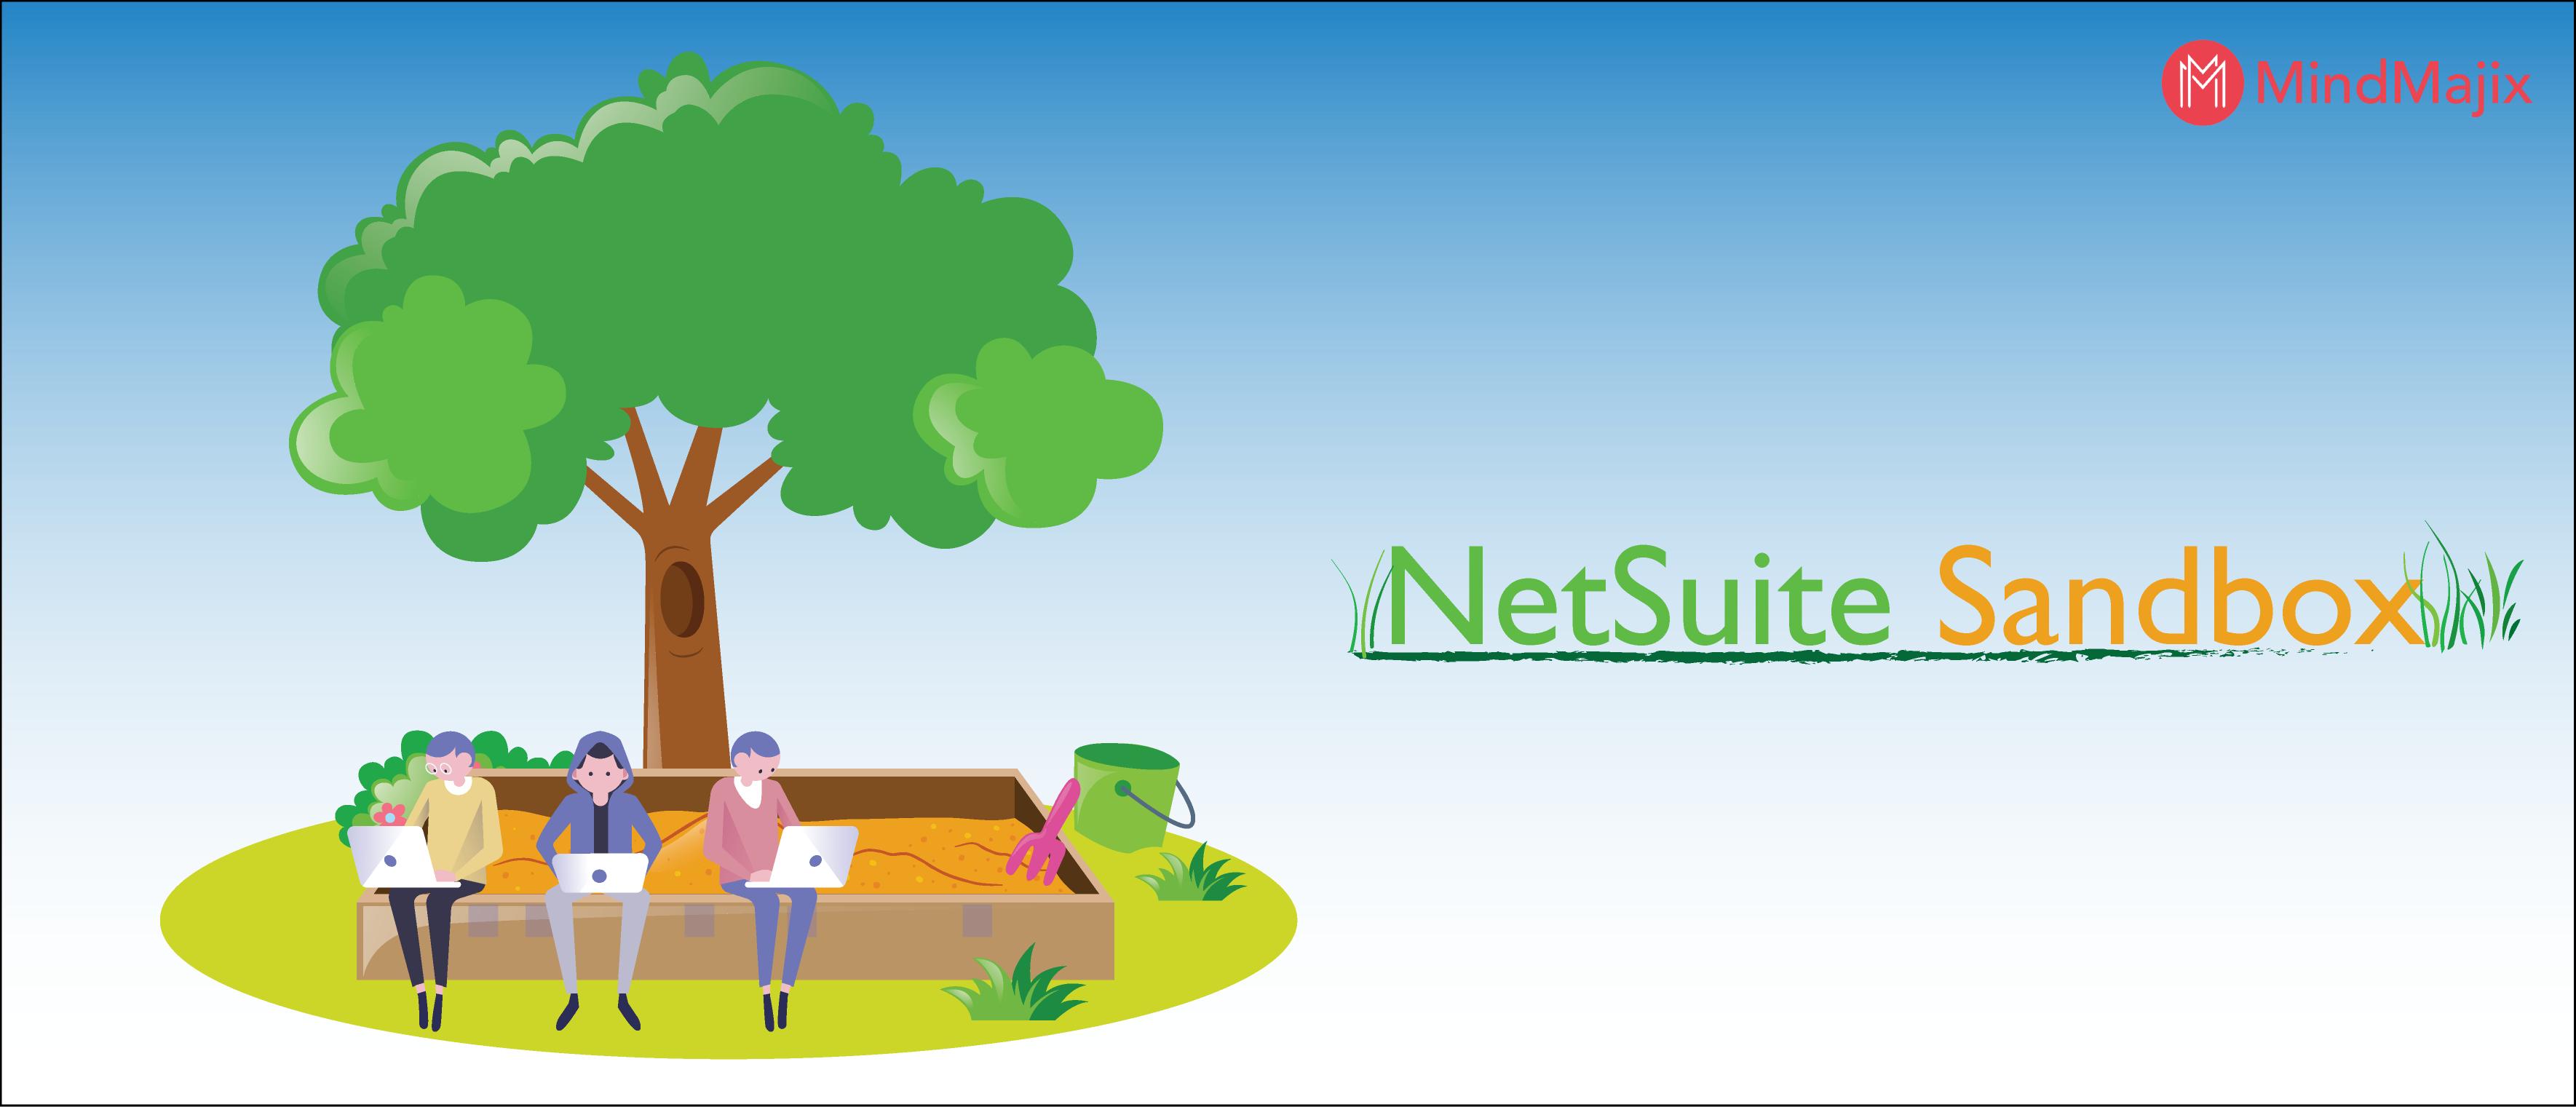 NetSuite Sandbox